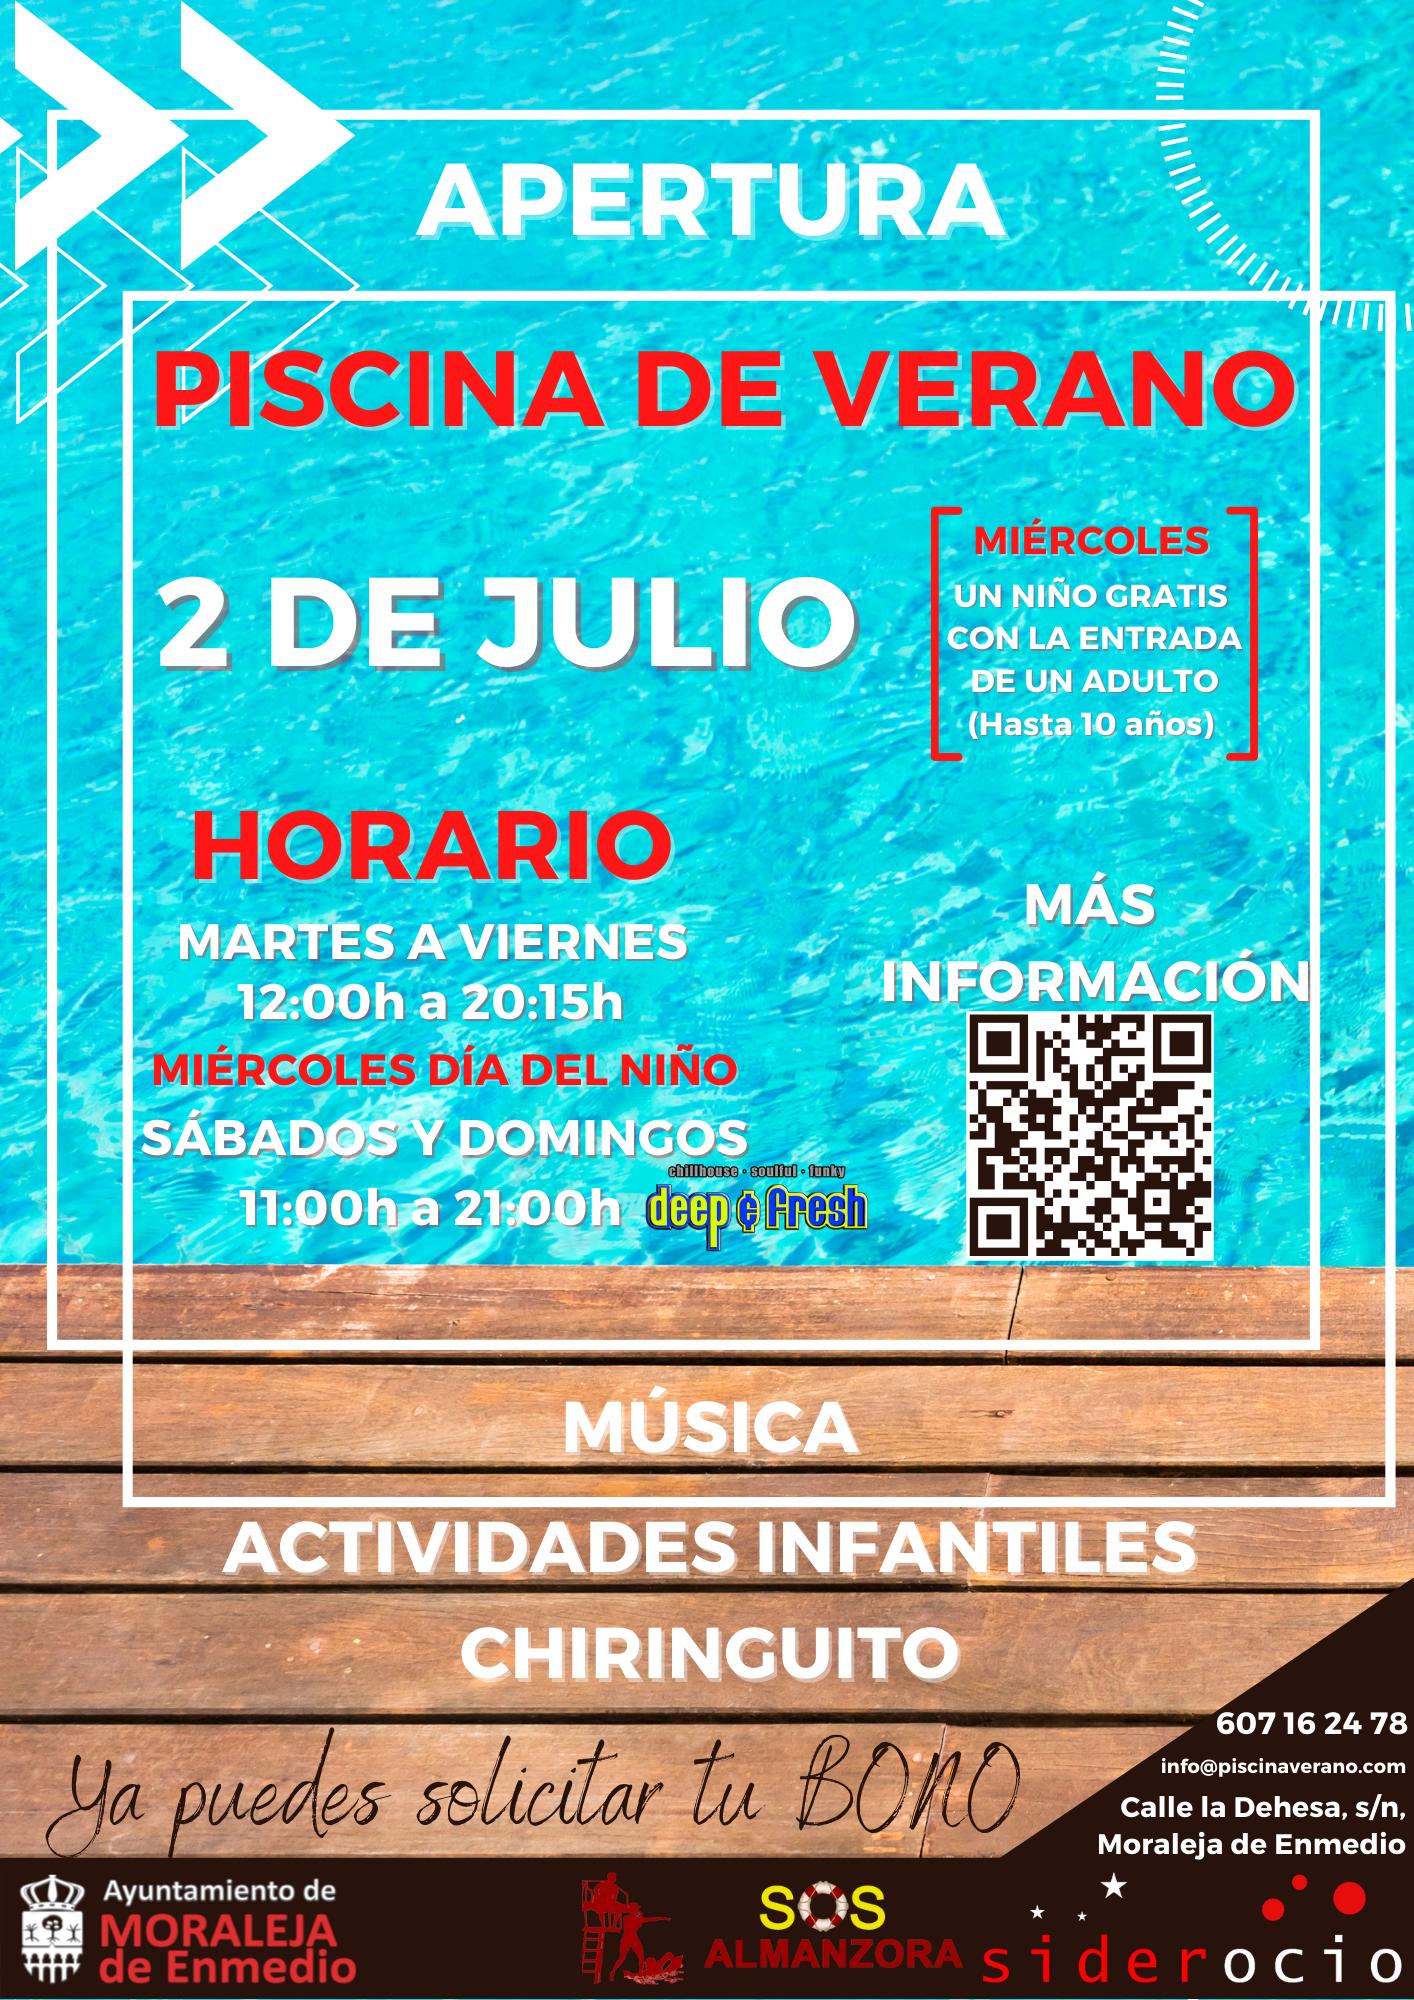 PISCINA MUNICIPAL DE VERANO